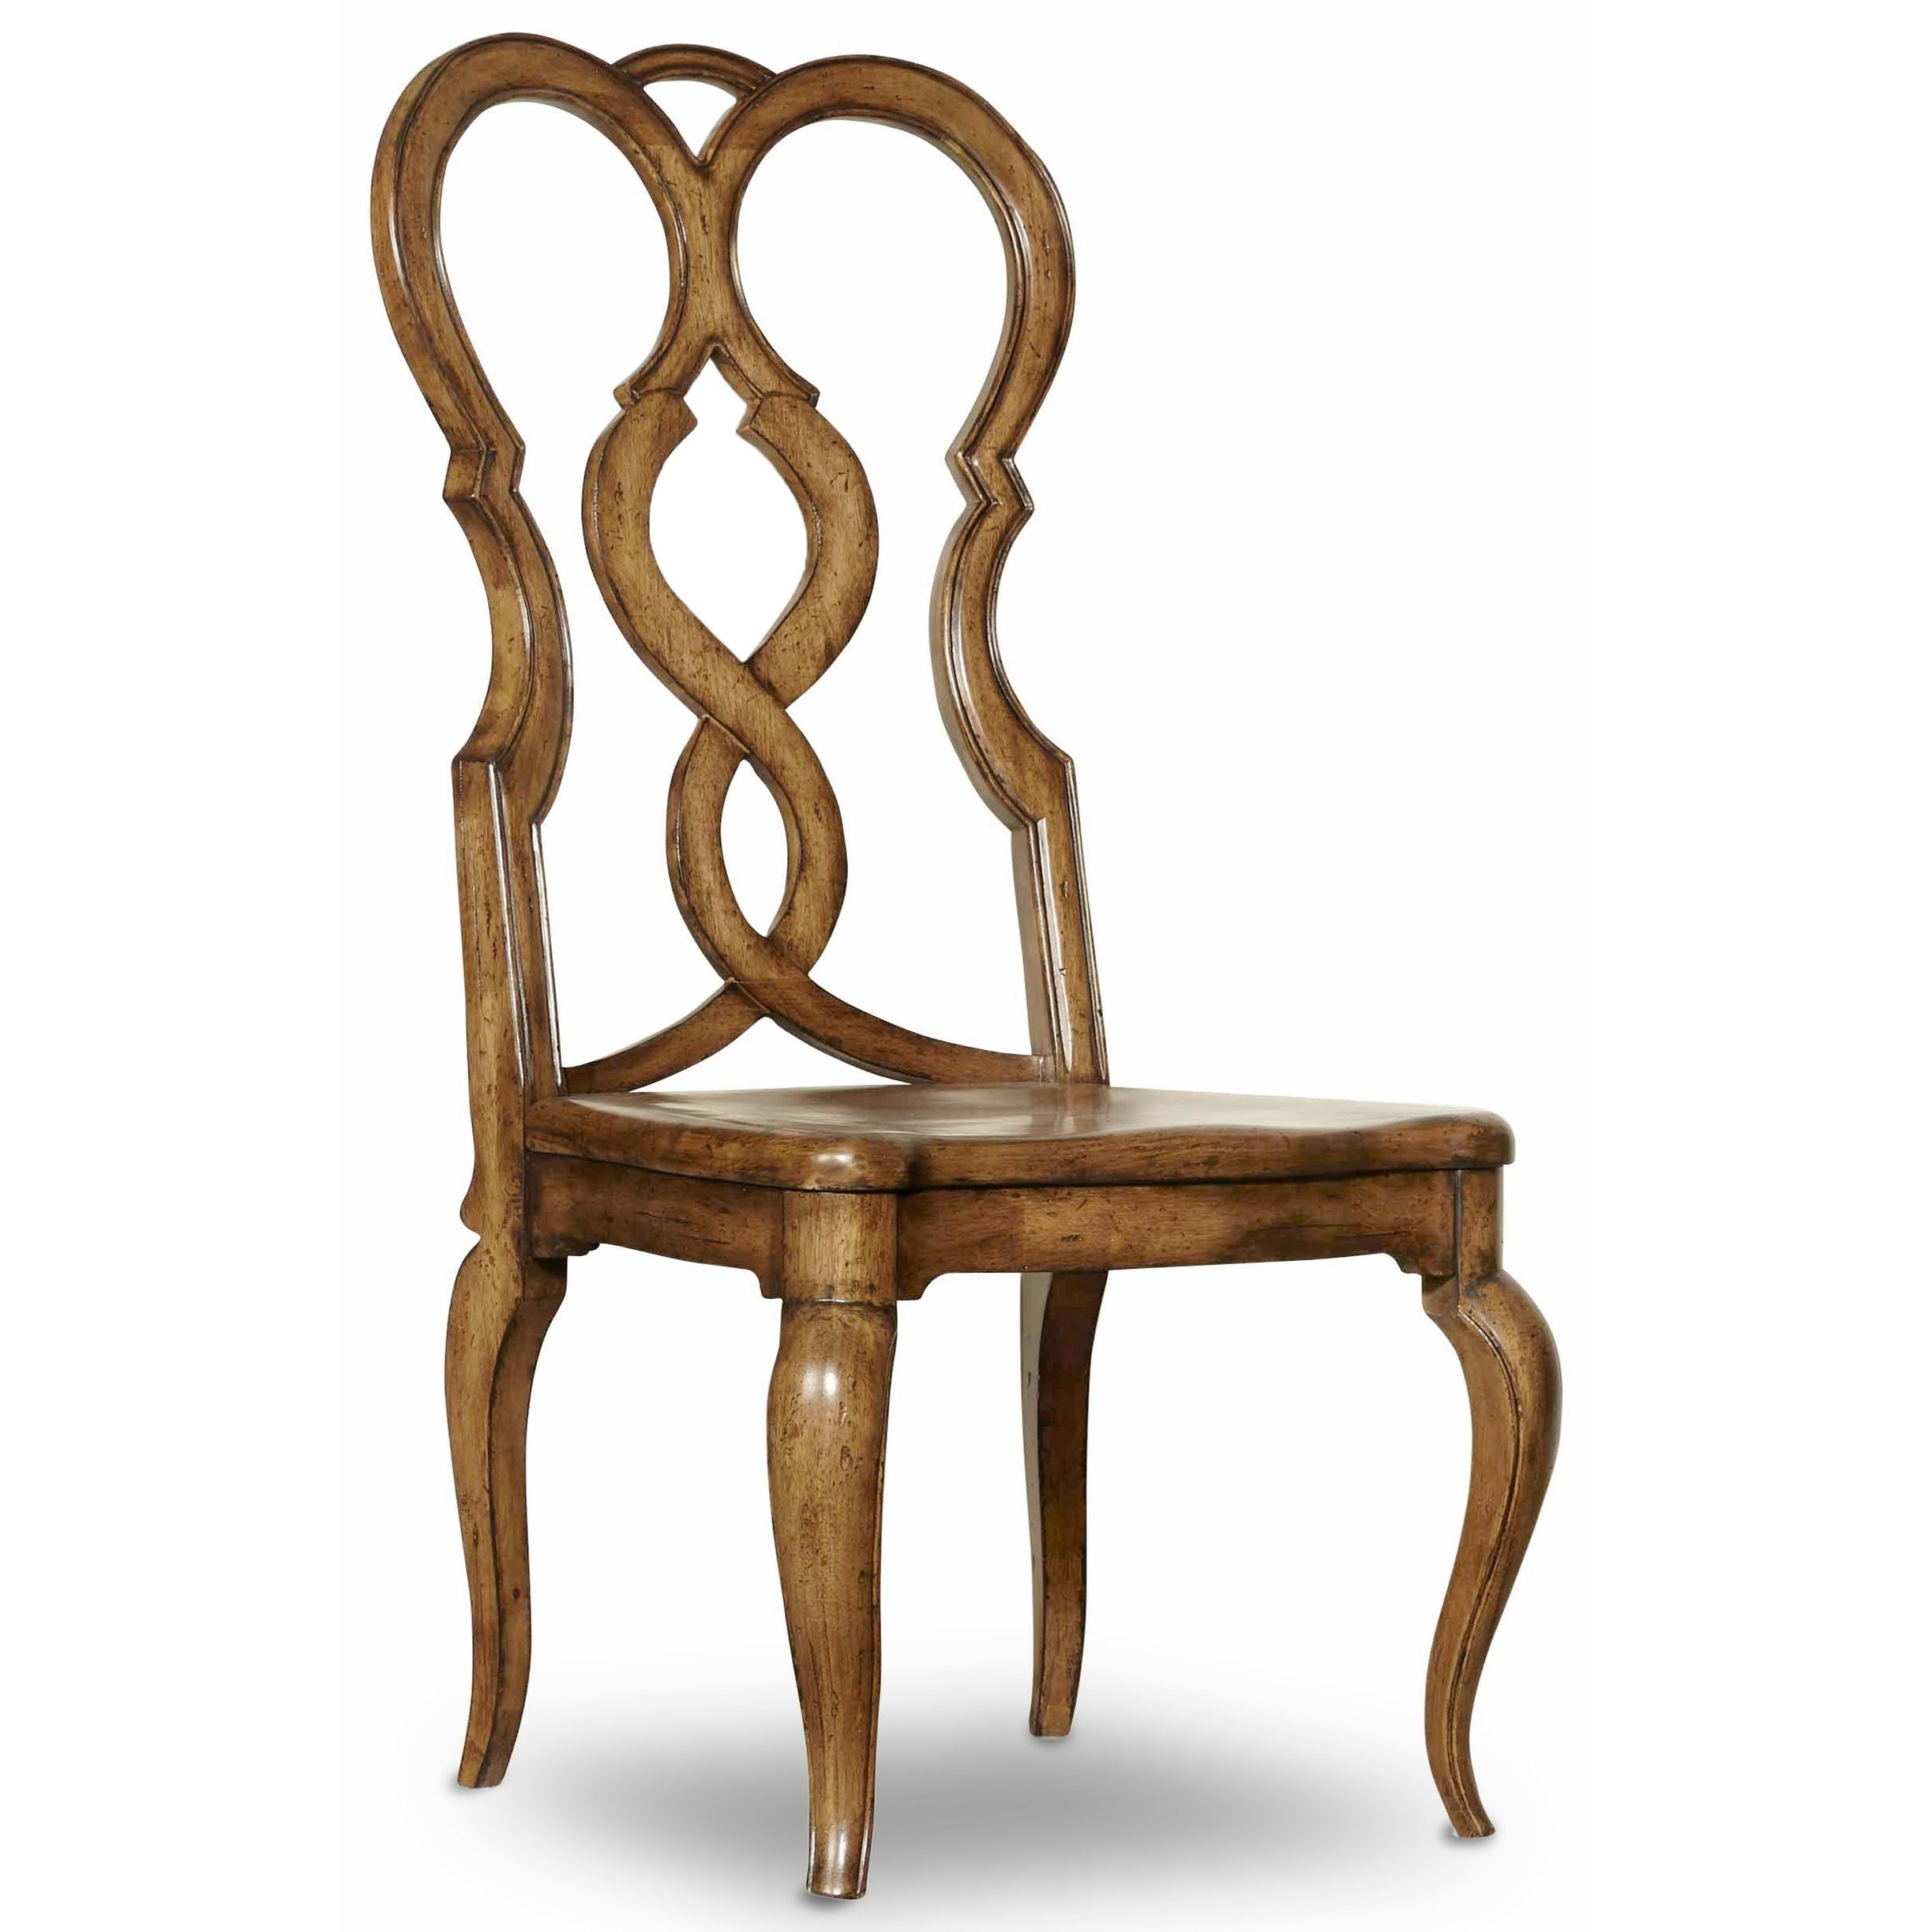 Hooker Furniture Auberose Splatback Wood Seat Side Chair - Item Number: 1595-75310E-BRN